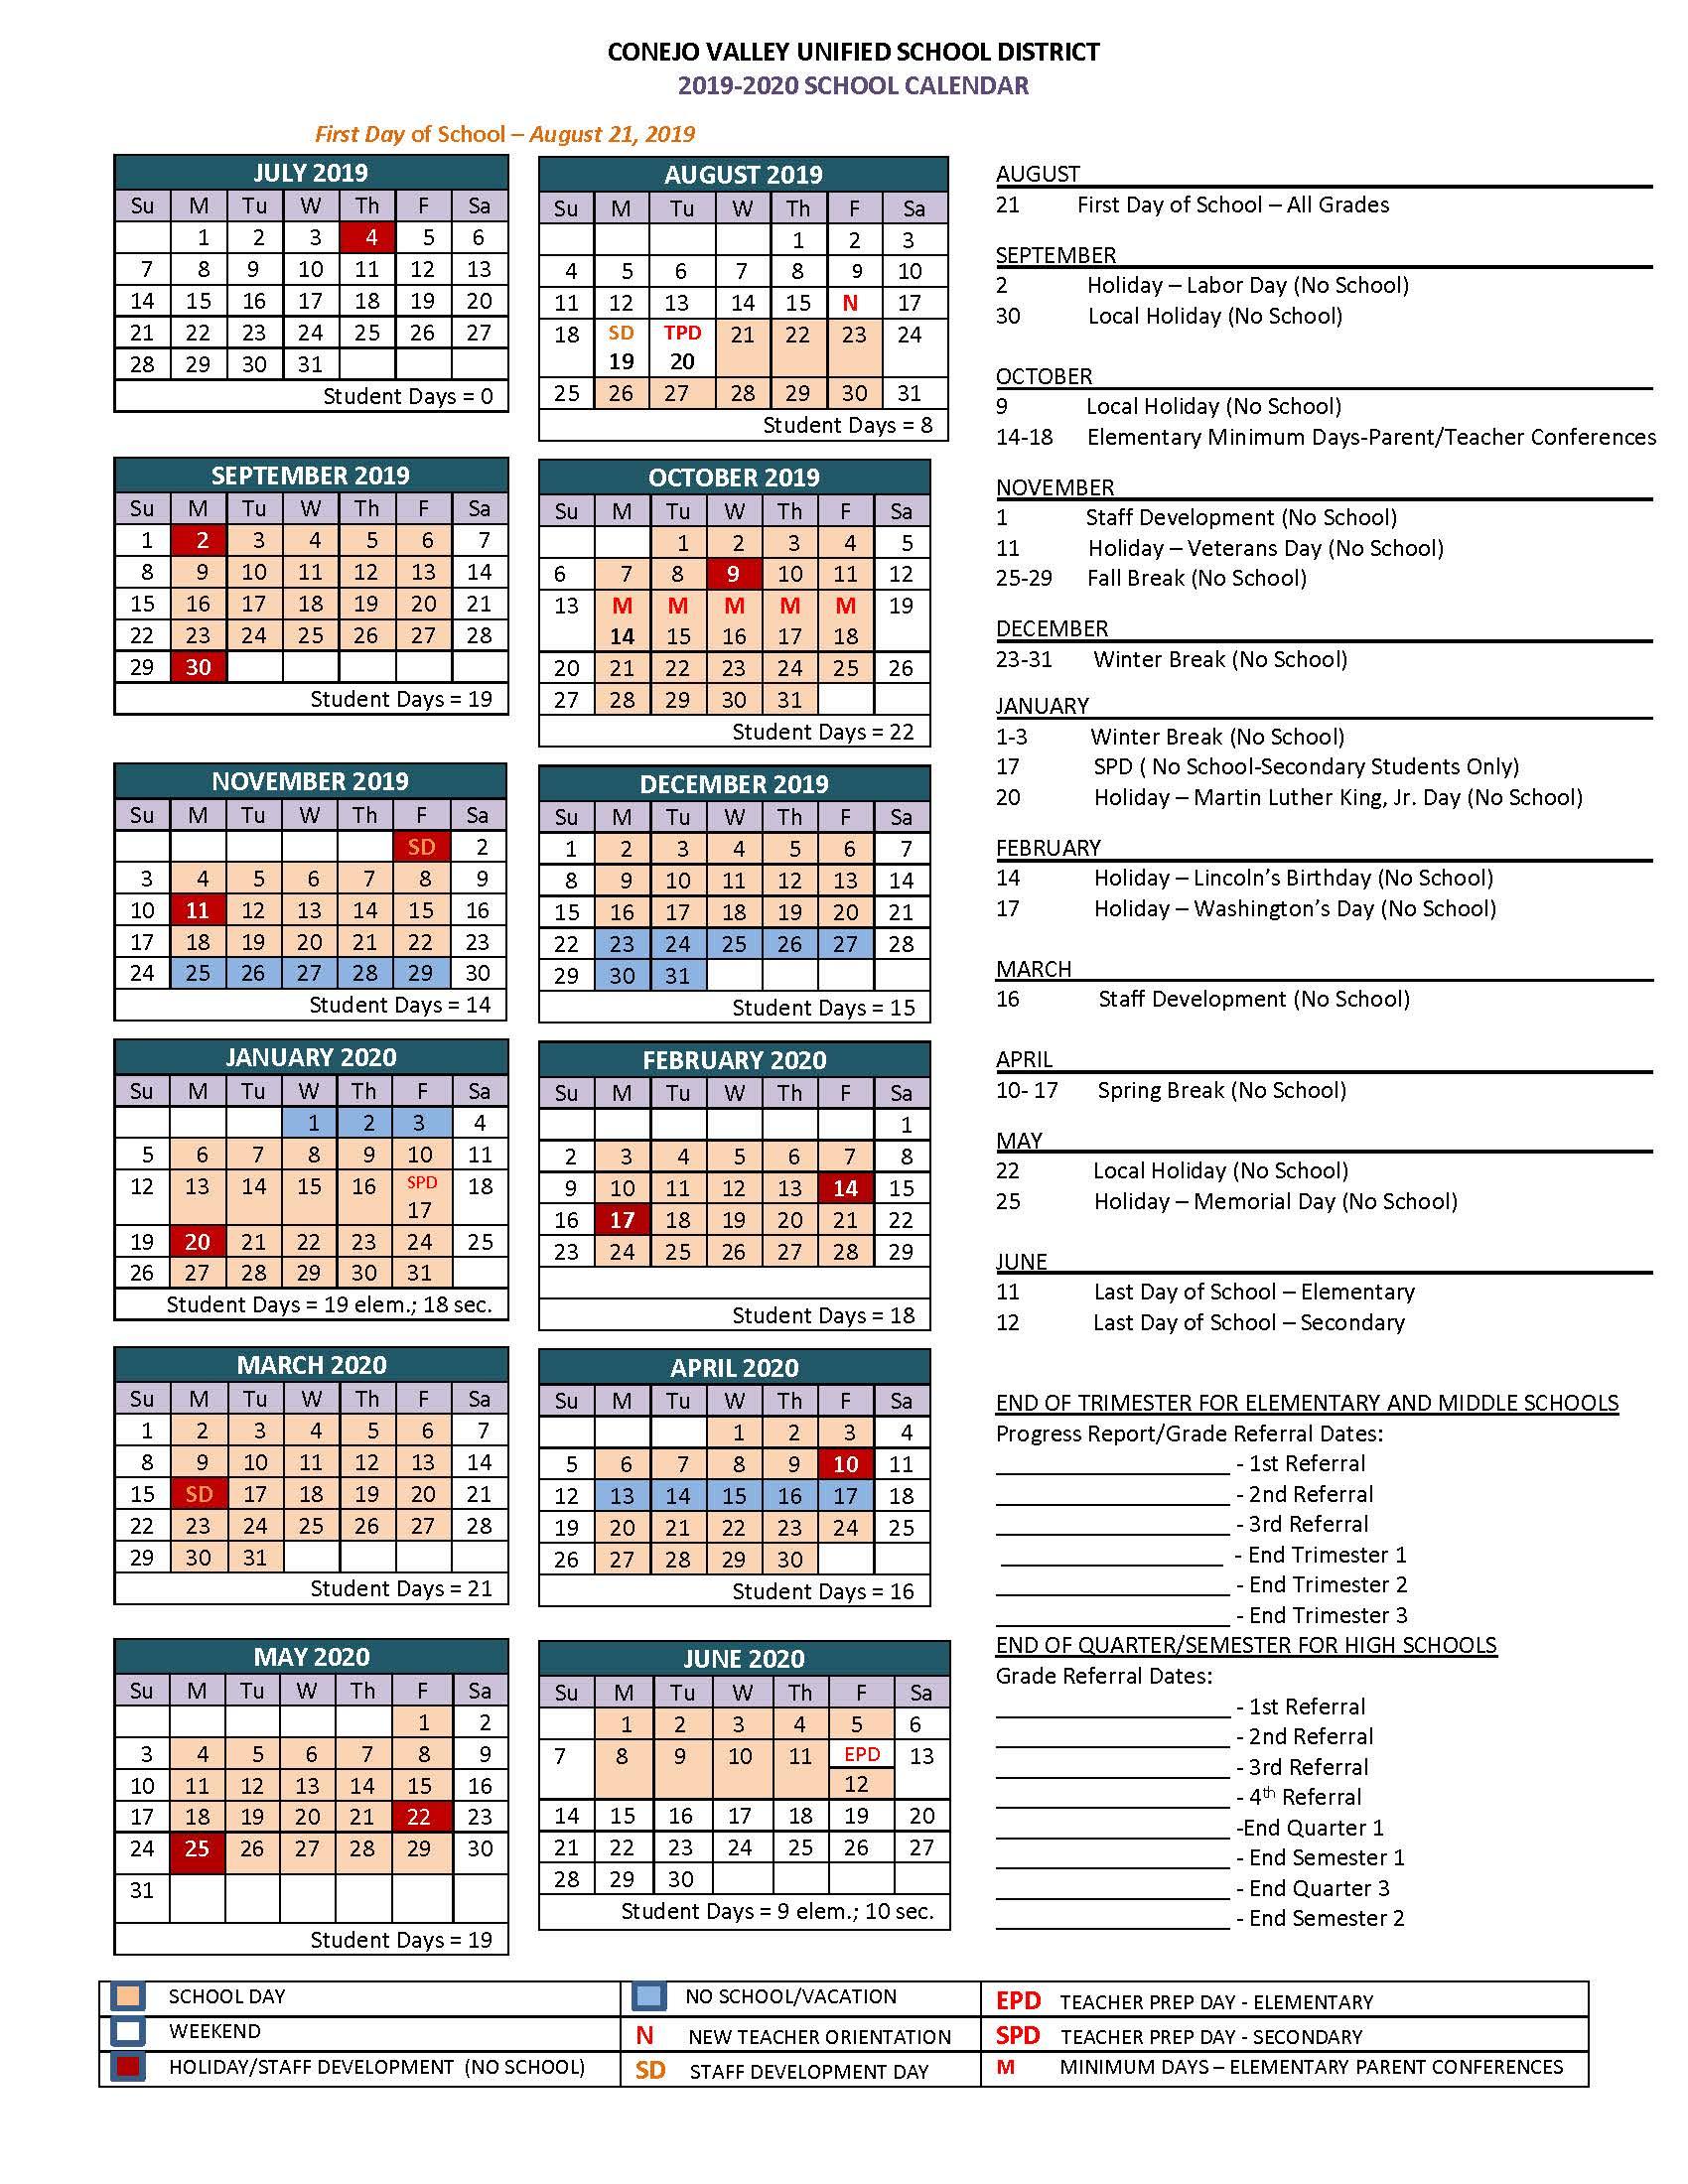 Wyoming University Calendar | Printable Calendar 2020 2021 Pertaining To Texas Tech Holiday 2021